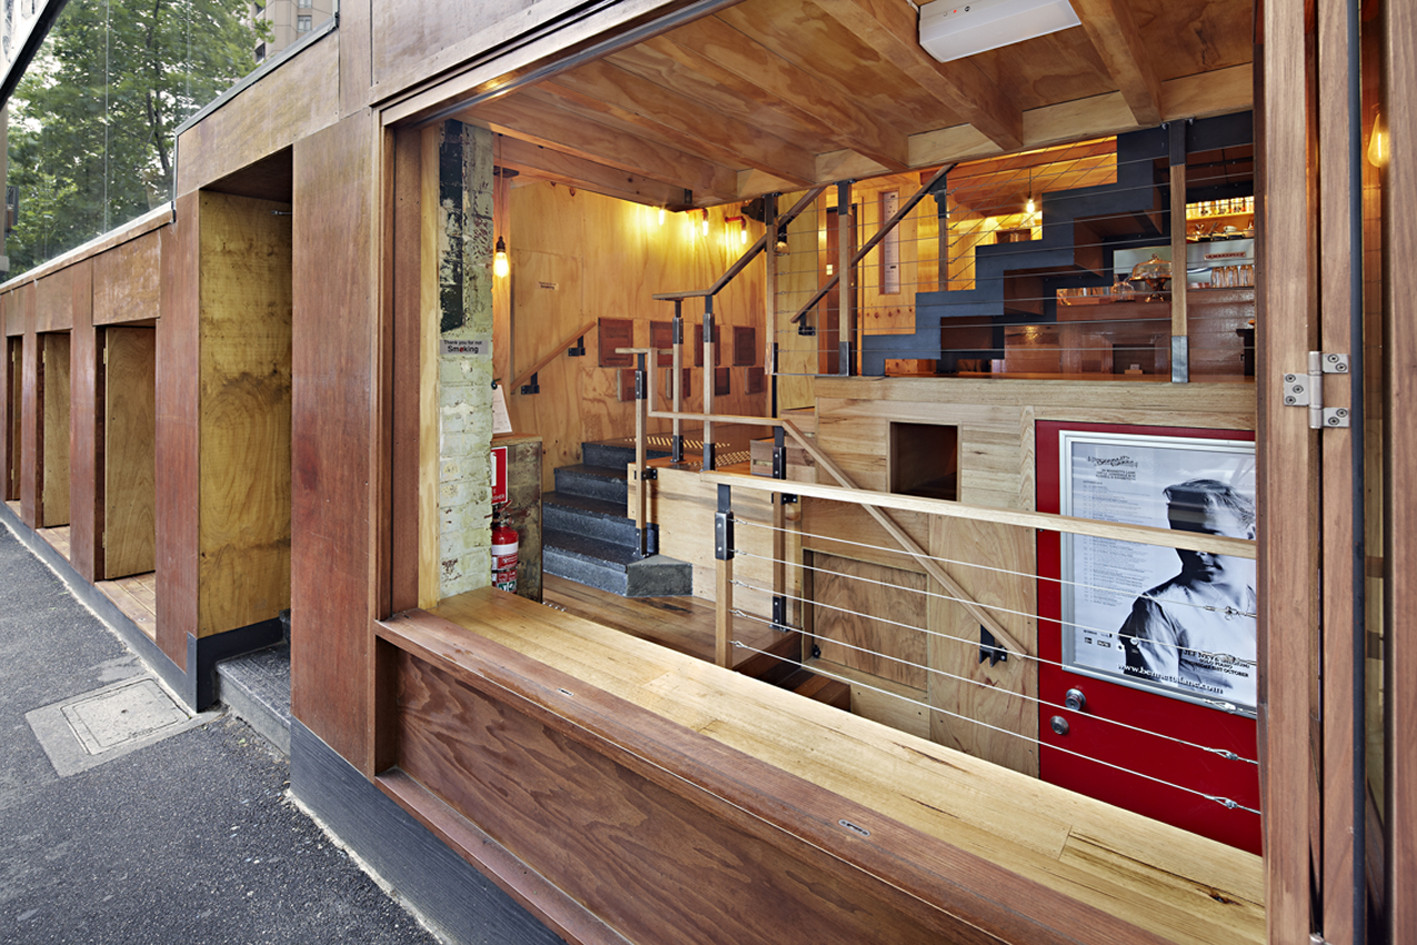 Melon Cafe Bar